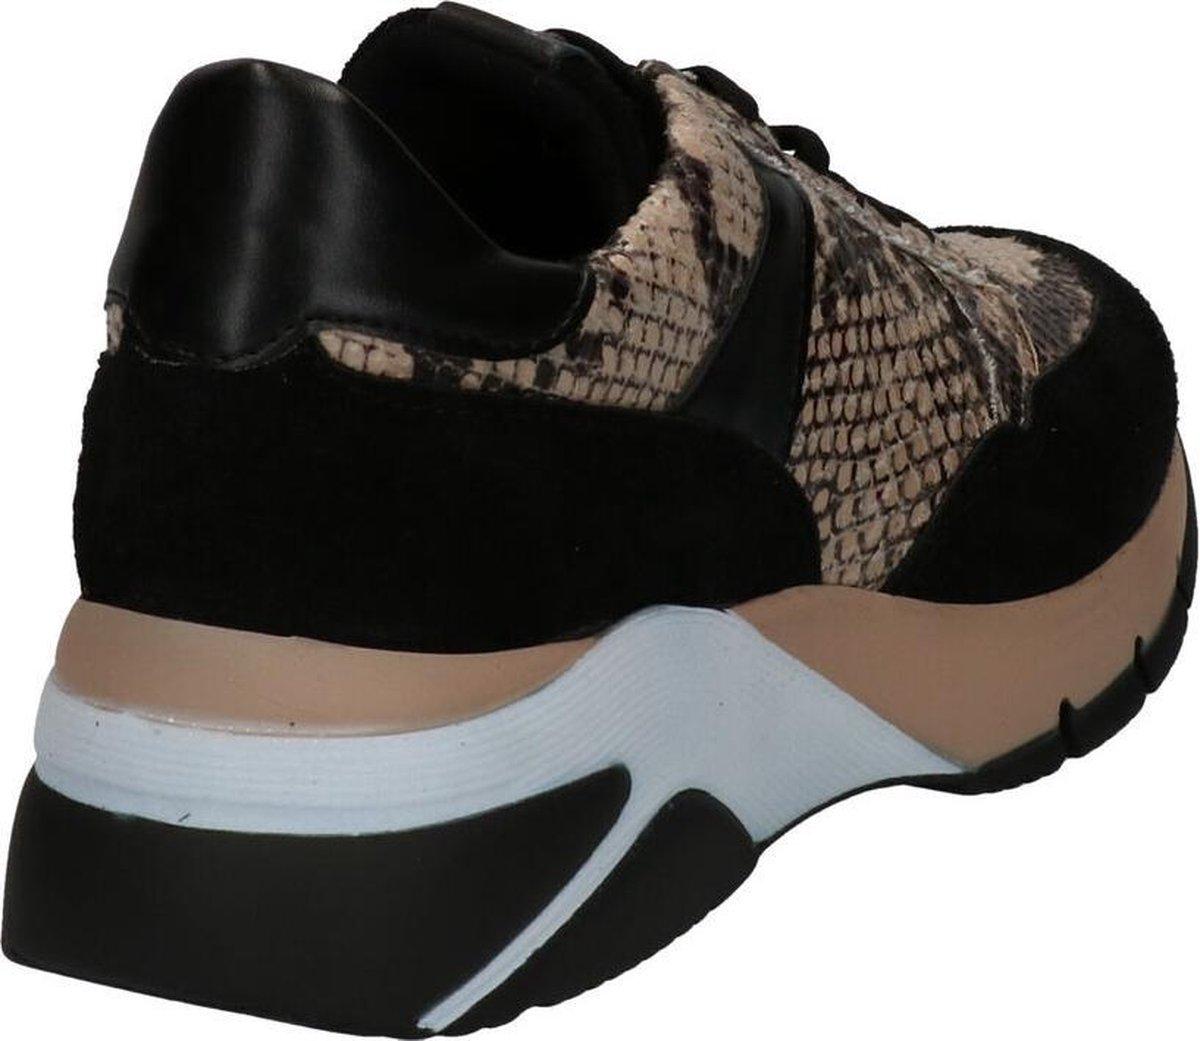 Tamaris Beige/Zwarte Sneakers Dames 40 Sneakers